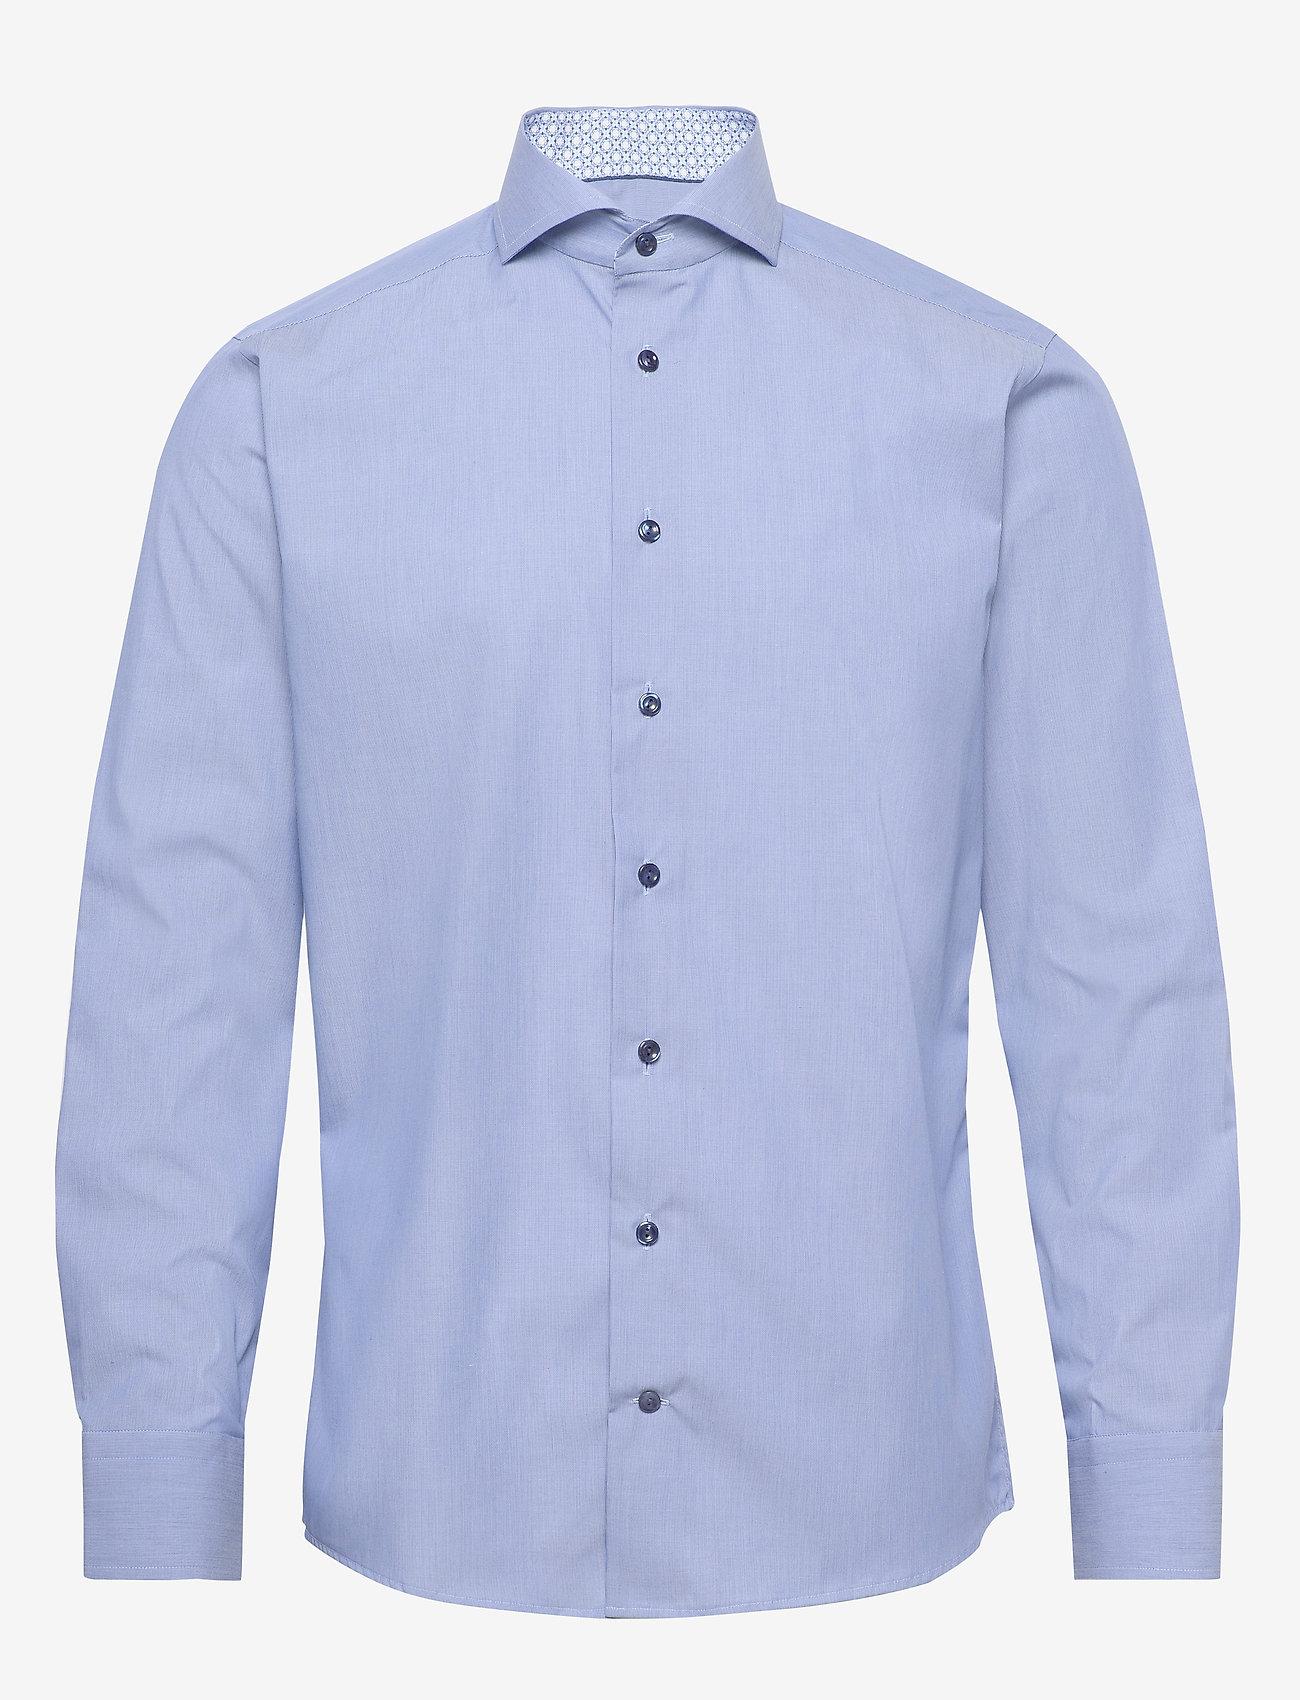 Eton - Blue hairline striped shirt – navy details - peruspaitoja - blue